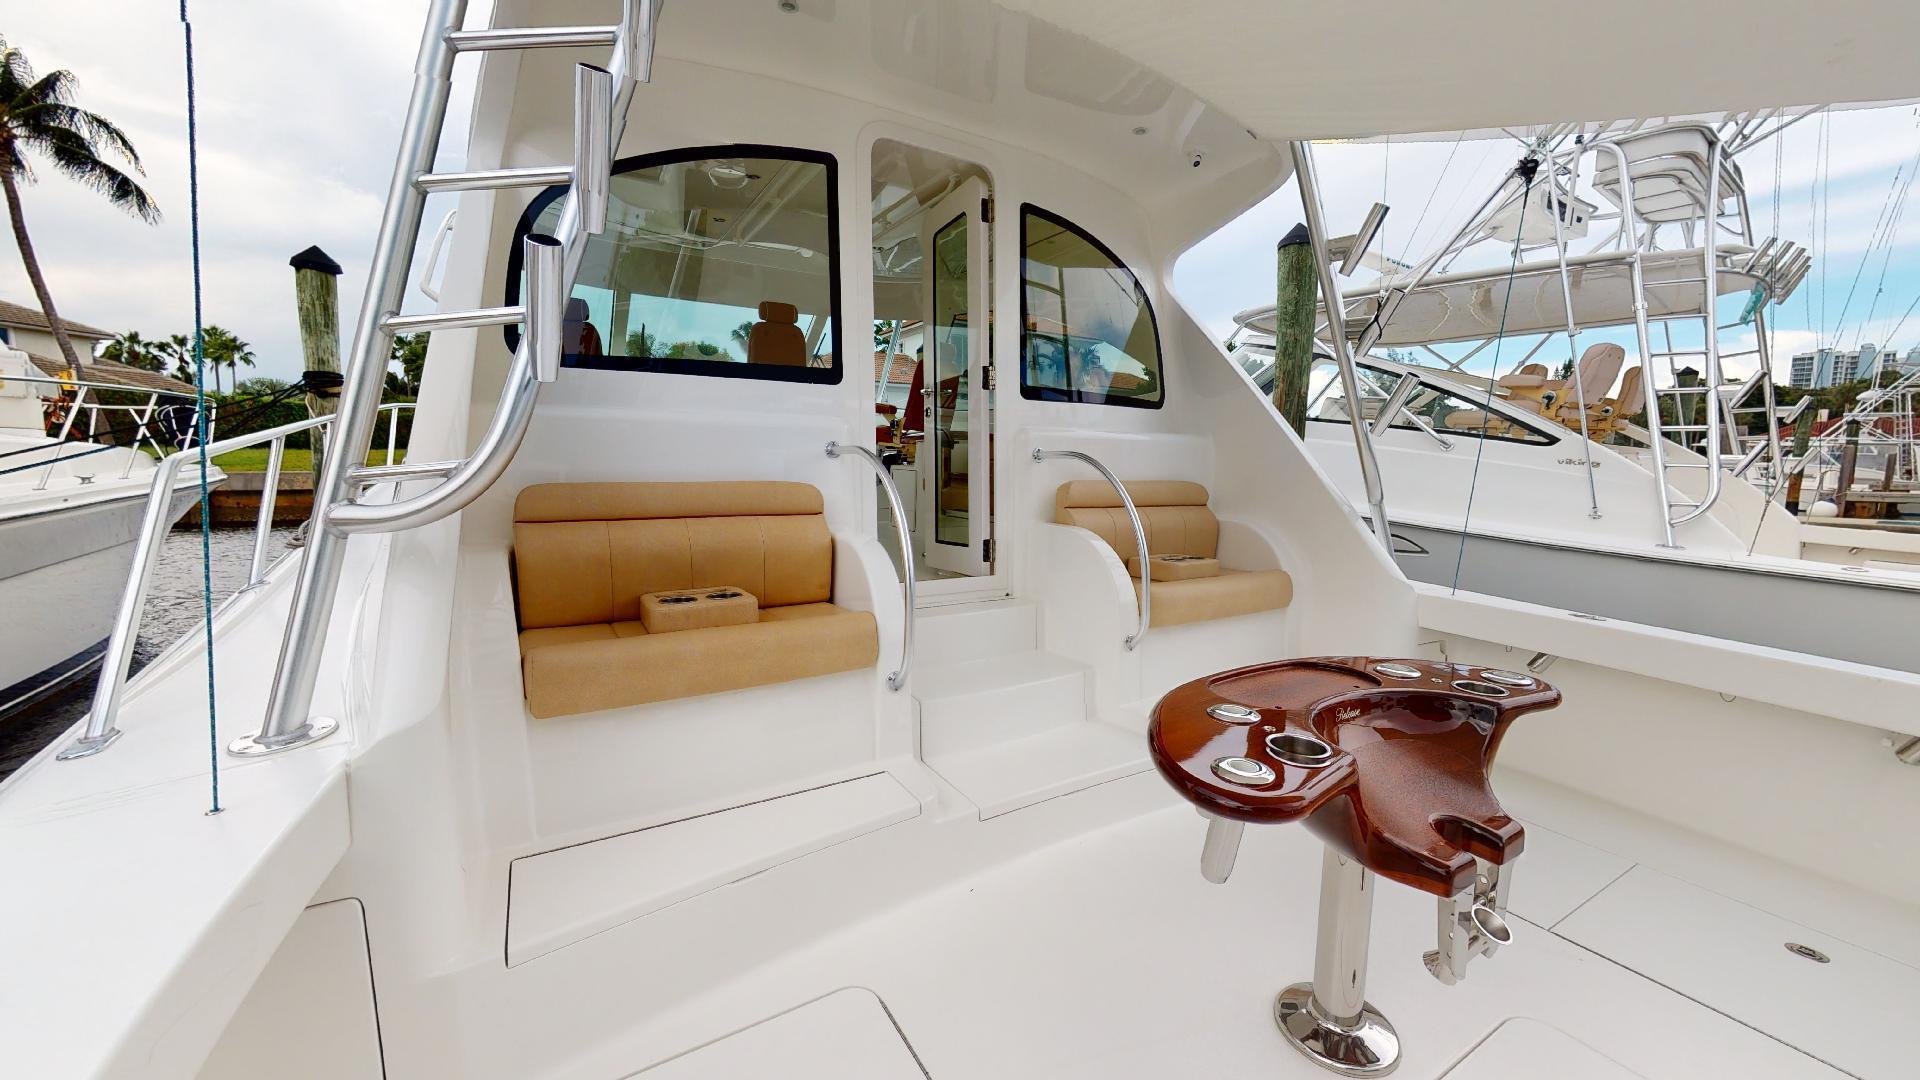 Viking-Sport Tower 2019-Salt Shaker II North Palm Beach-Florida-United States-Cockpit-1498711 | Thumbnail